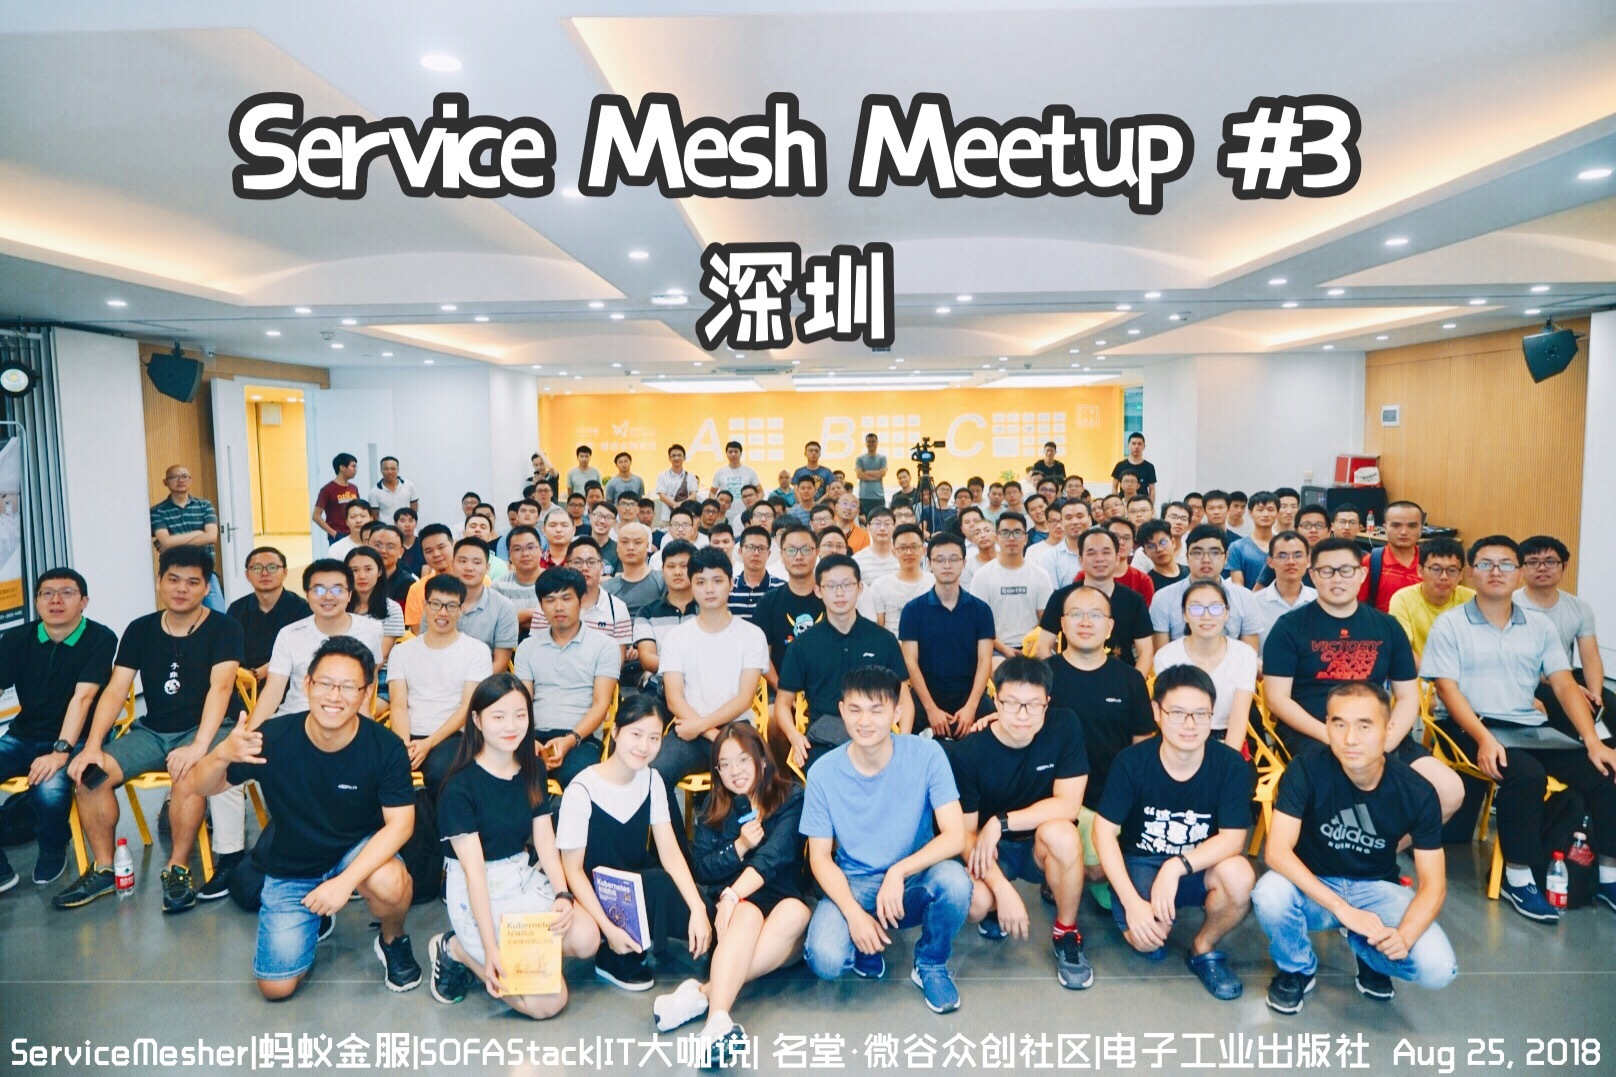 Service Mesh Meetup 深圳站